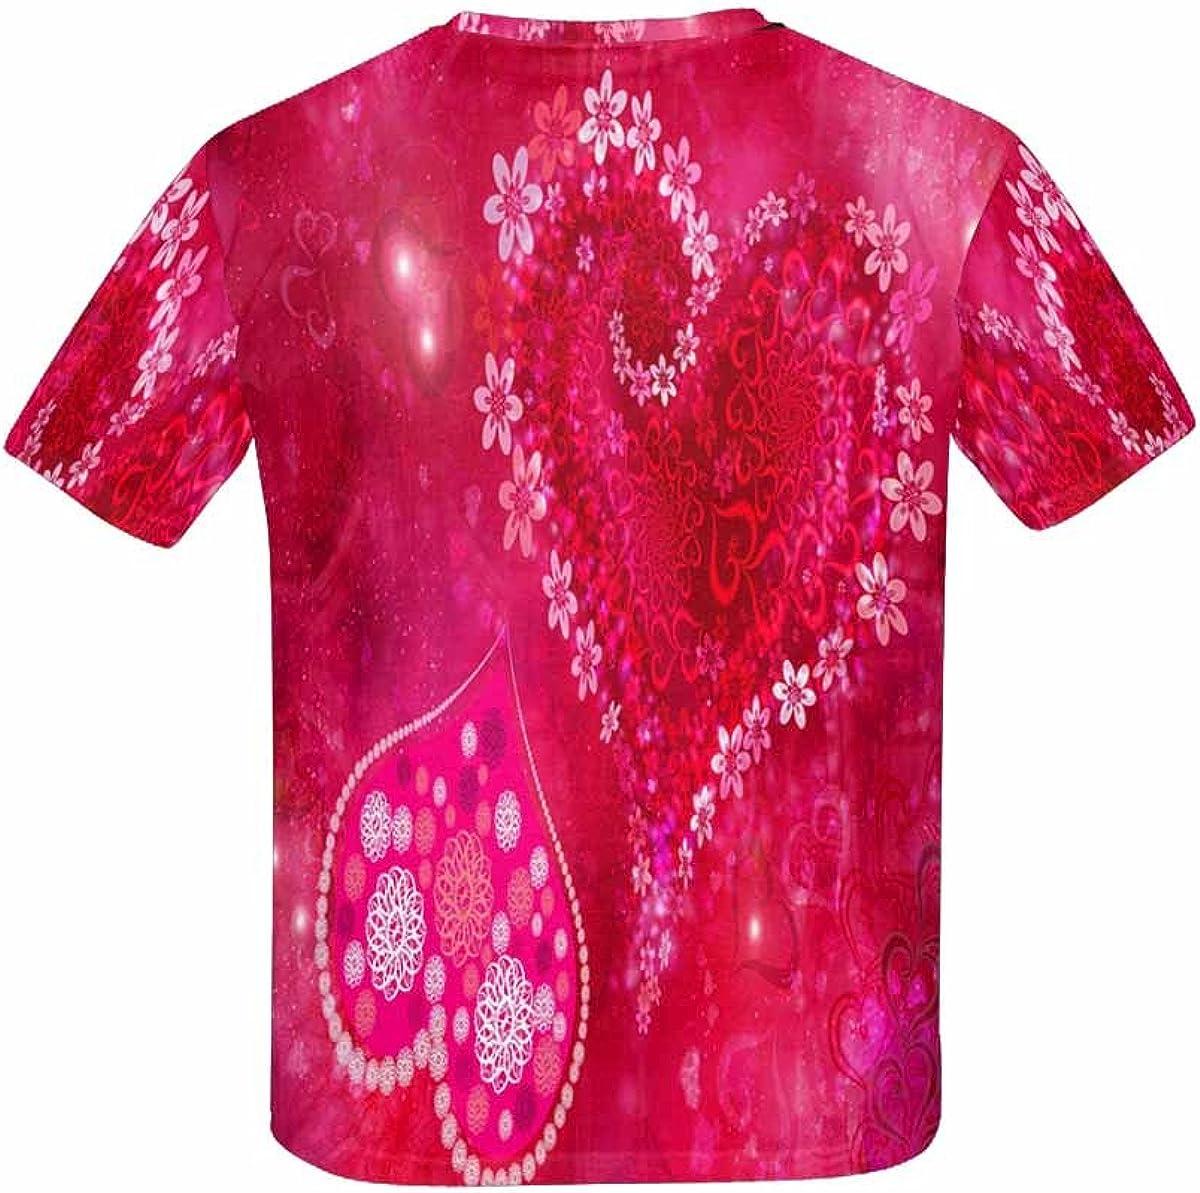 INTERESTPRINT St Valentines Day Heart Flowers Childs T-Shirt XS-XL